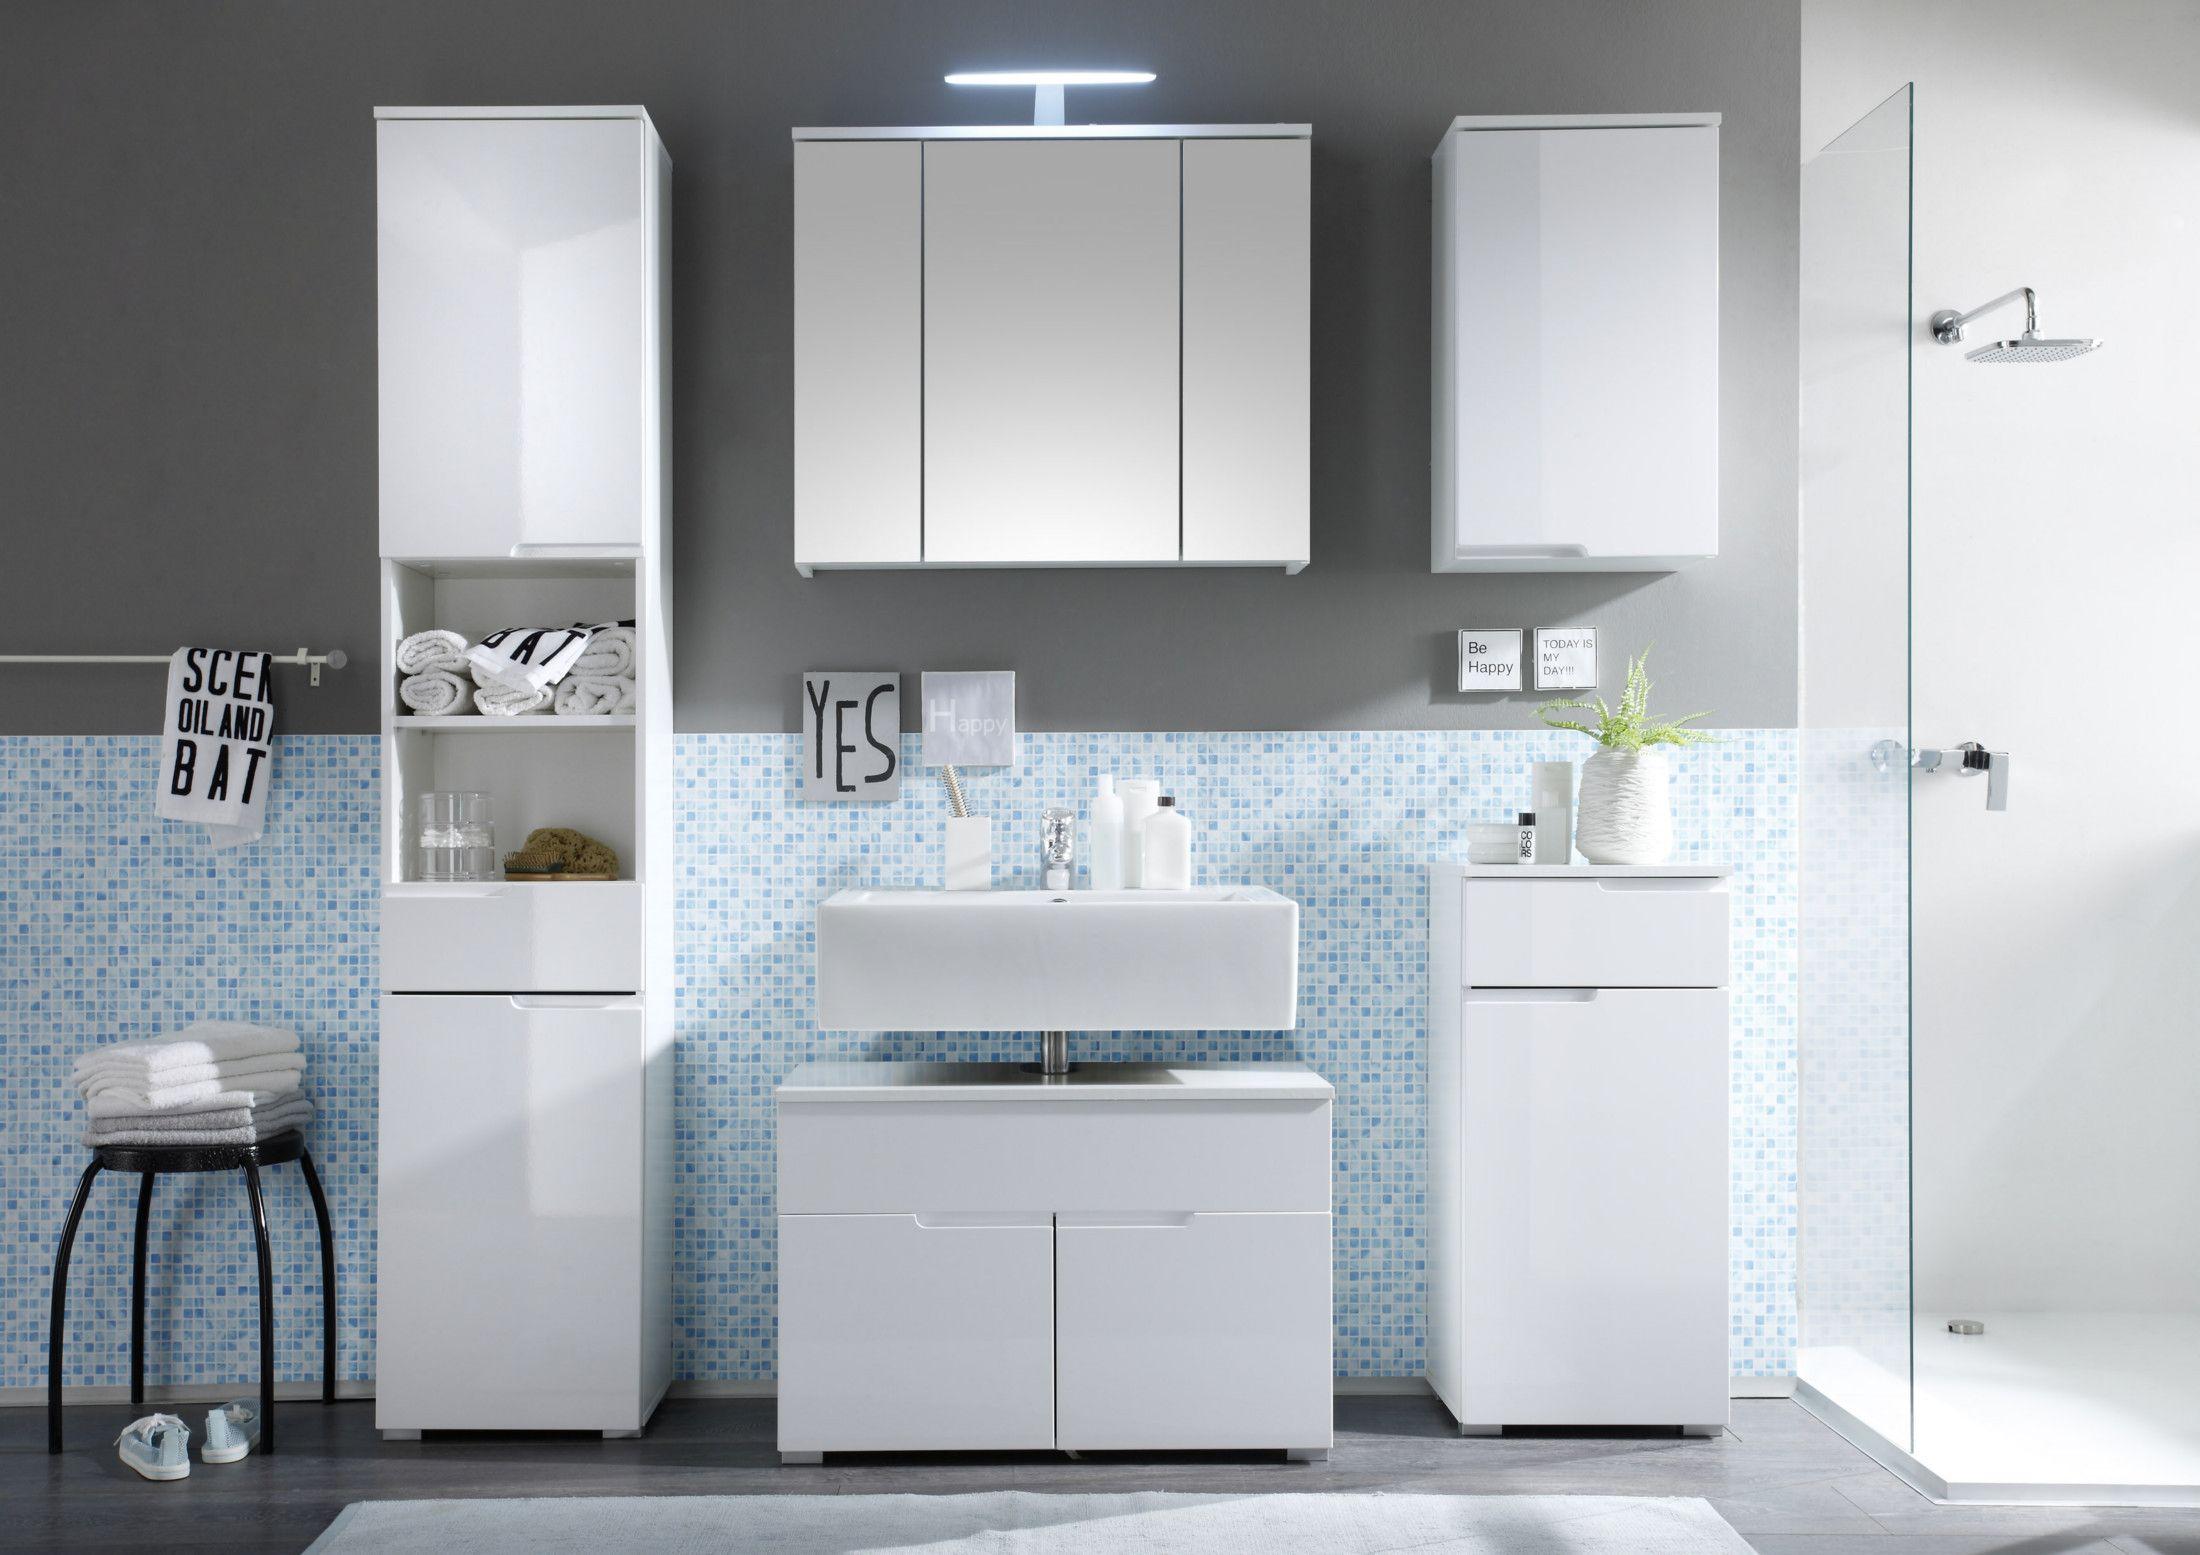 Badezimmer Komplettset ~ Badezimmer set weiss hochglanz woody 32 00067 holz modern jetzt